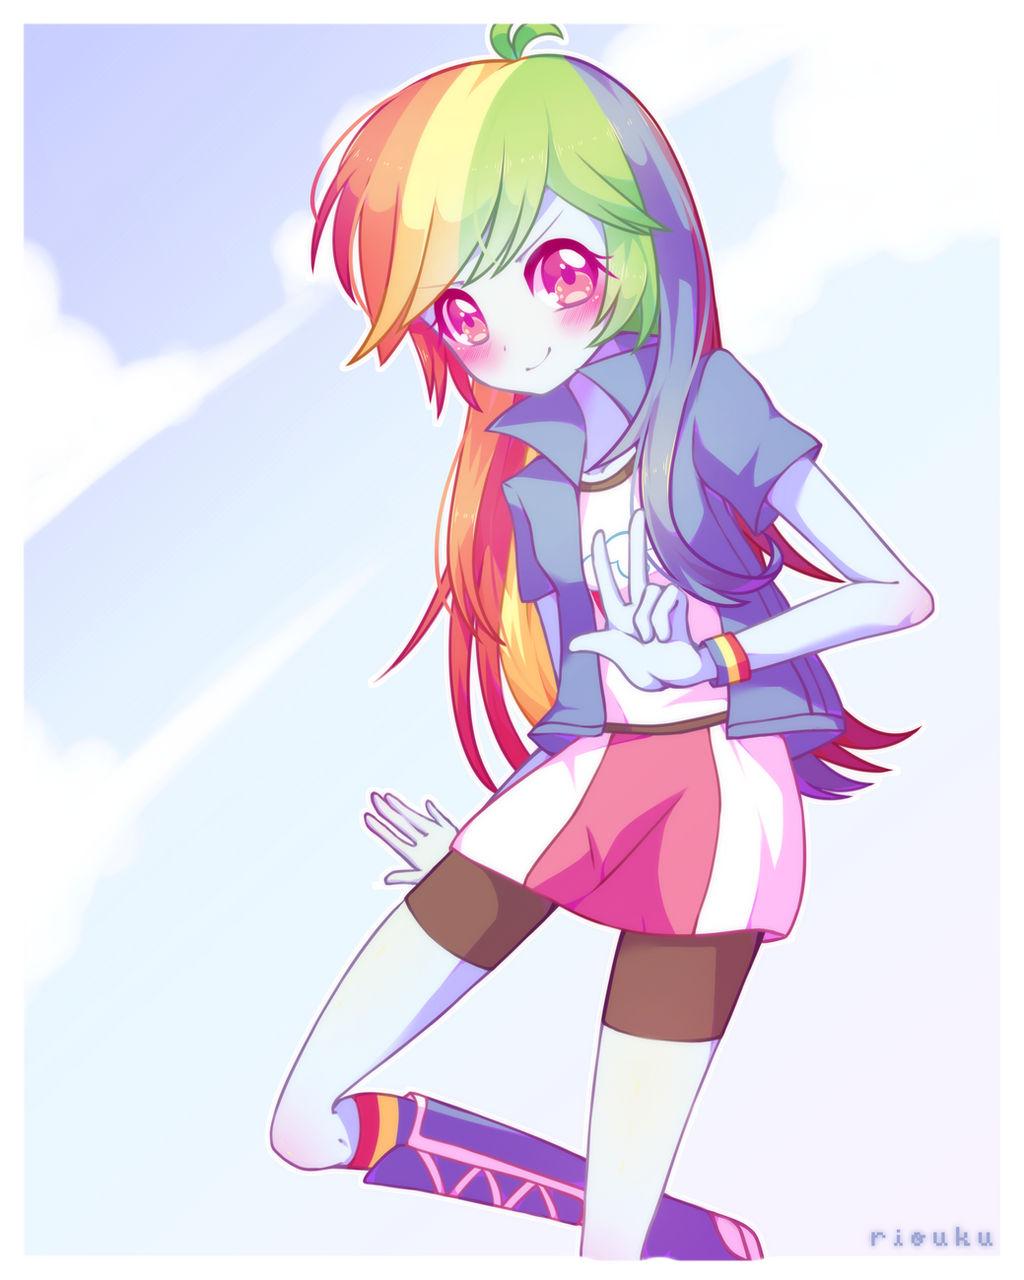 rainbow_dash_by_riouku_da0y3qi-fullview.